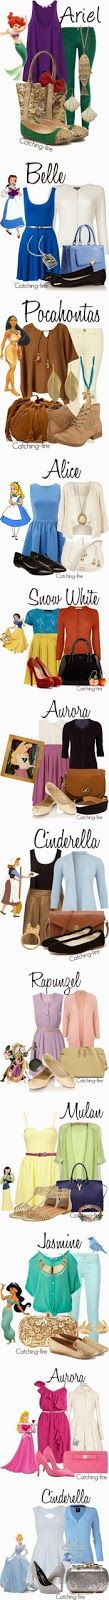 Teens Disney fashion inspiration   Fashion World. Love the last Cinderella one.